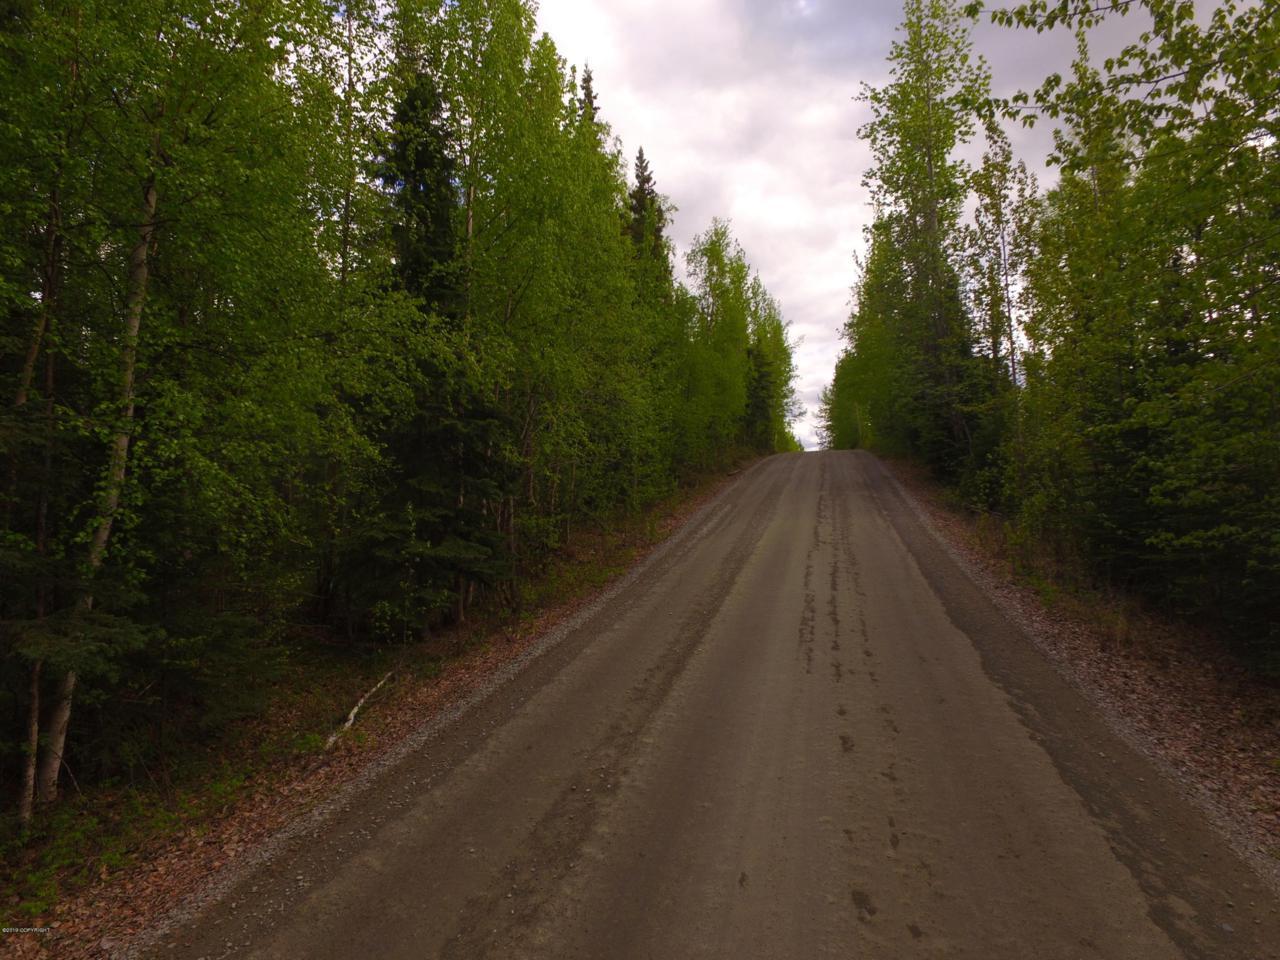 https://bt-photos.global.ssl.fastly.net/alaska/1280_boomver_1_19-8261-2.jpg